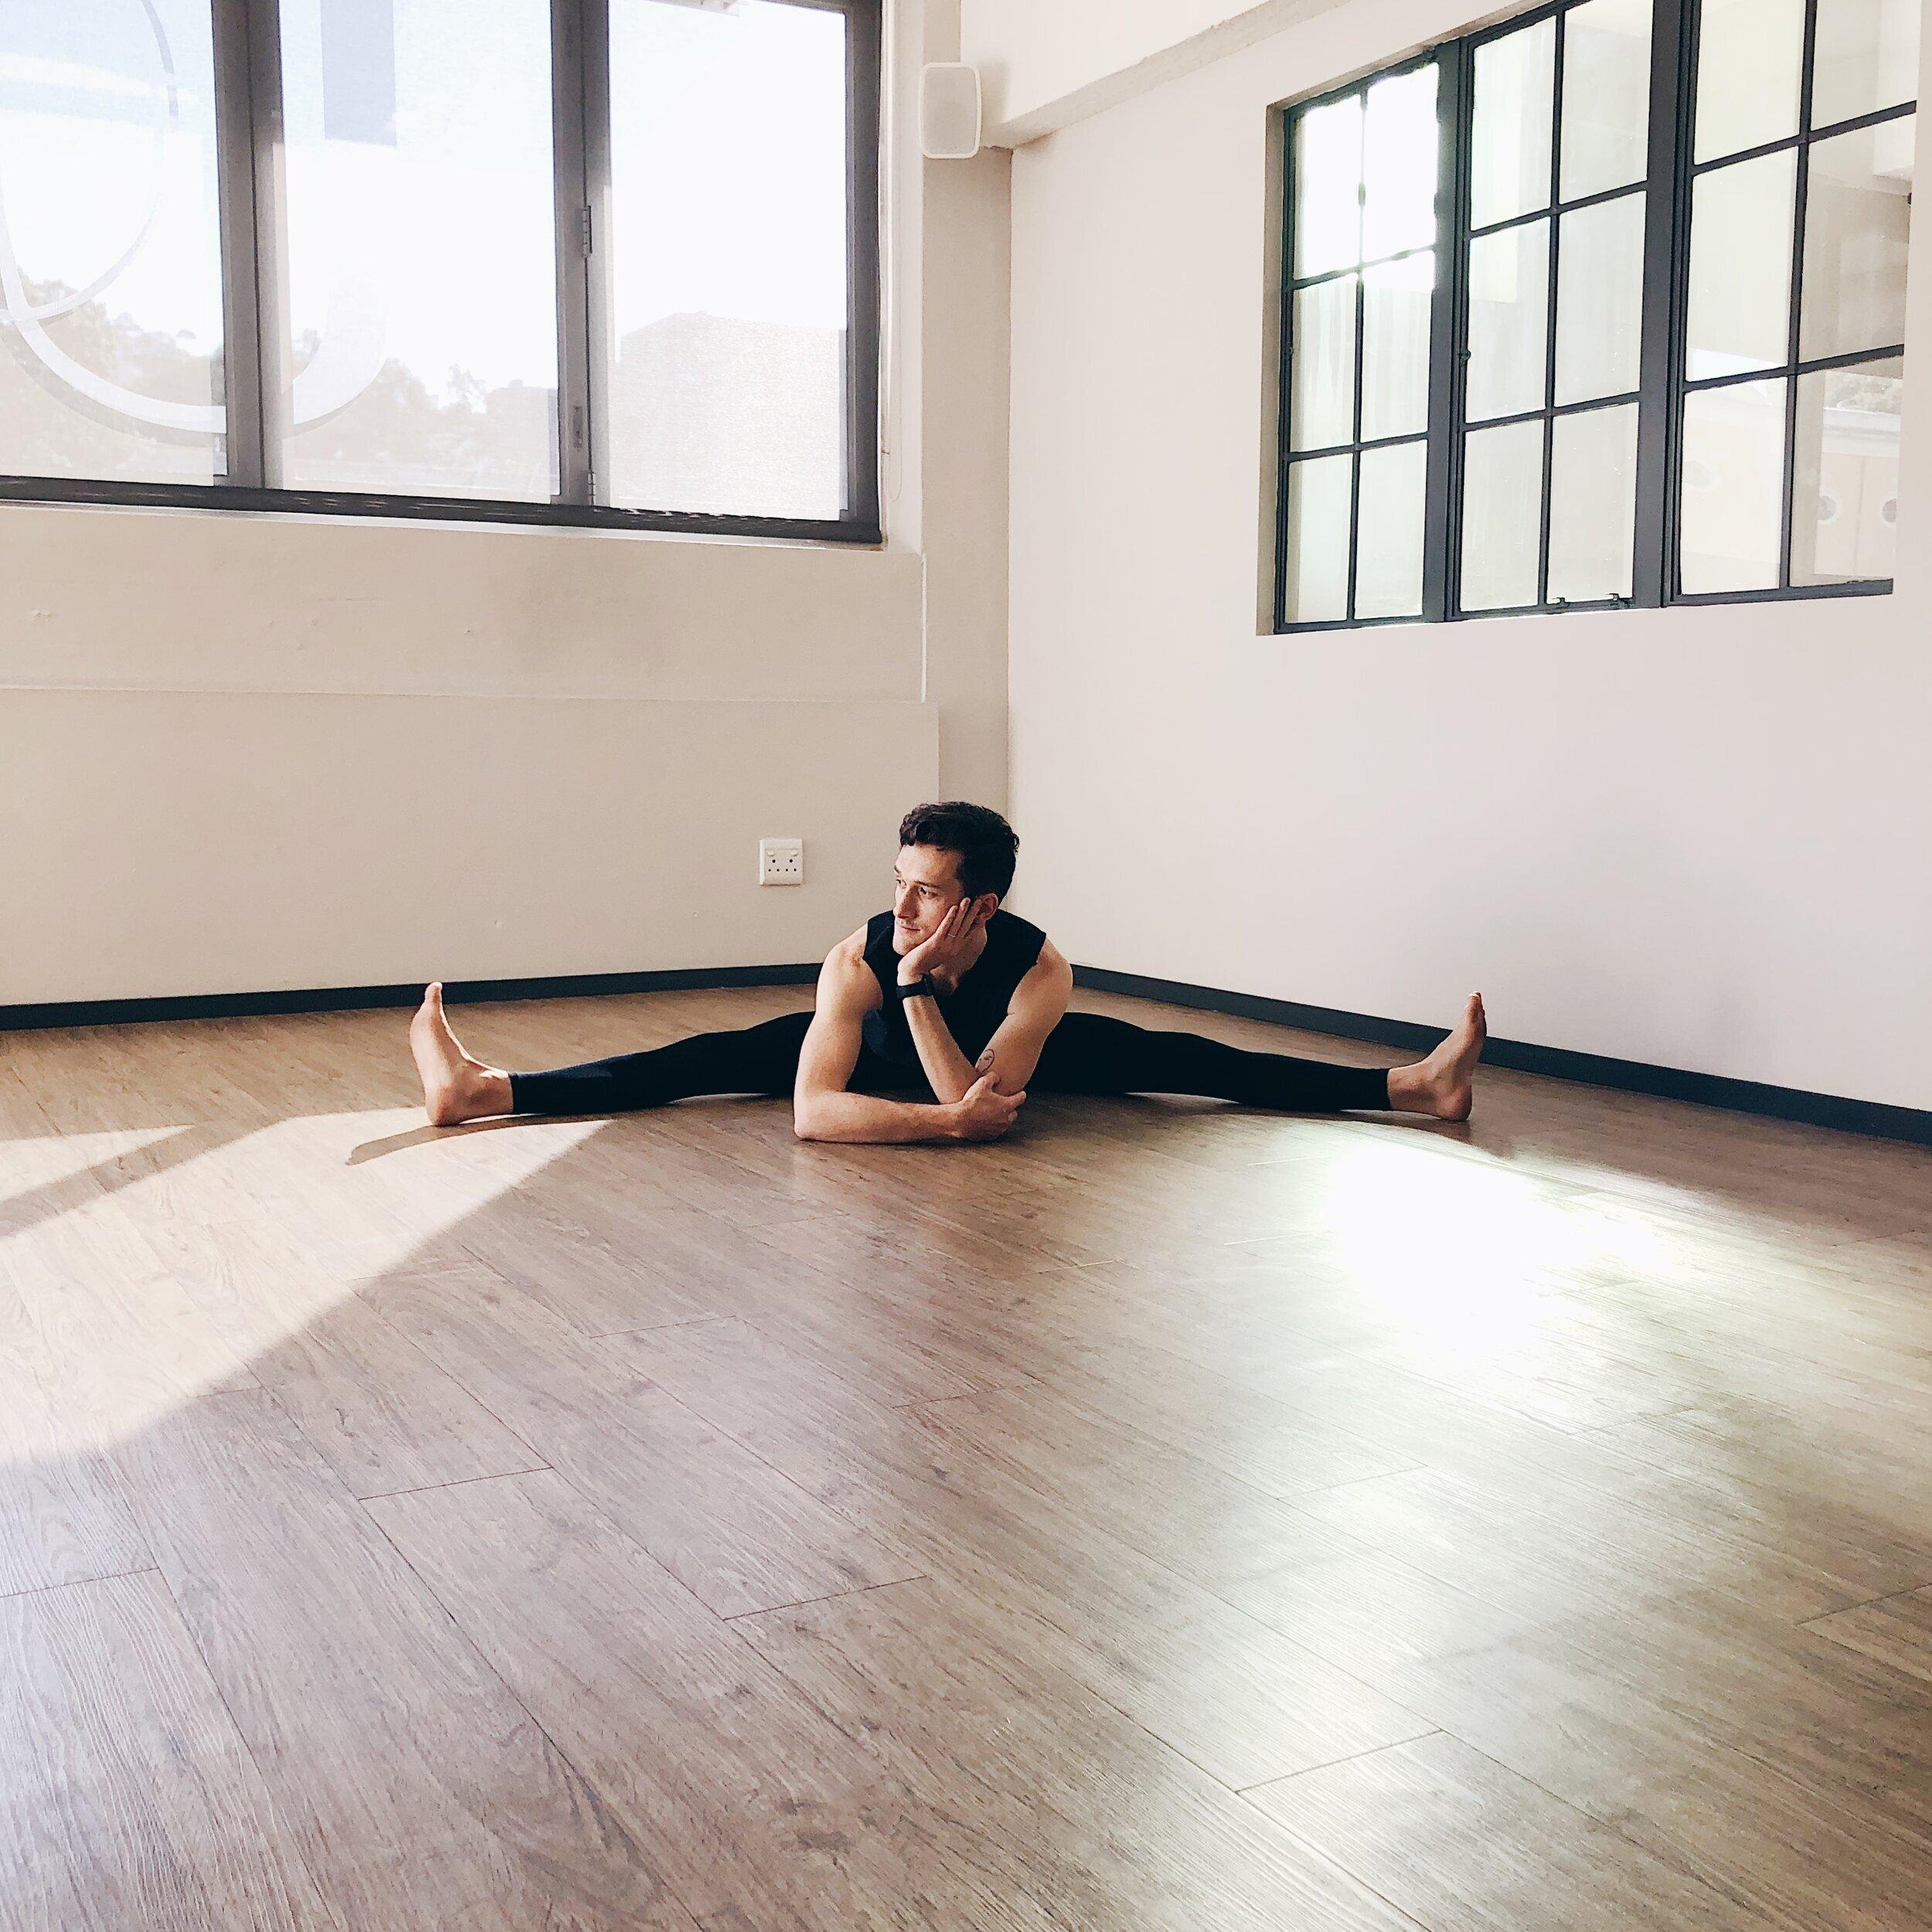 Cape Town - Hot Yoga, Vinyasa, Yin YogaStudios: Unraveled Yoga, Hot Dog Yoga and YogaSpiritWebsite | Email | Instagram072 695 7303